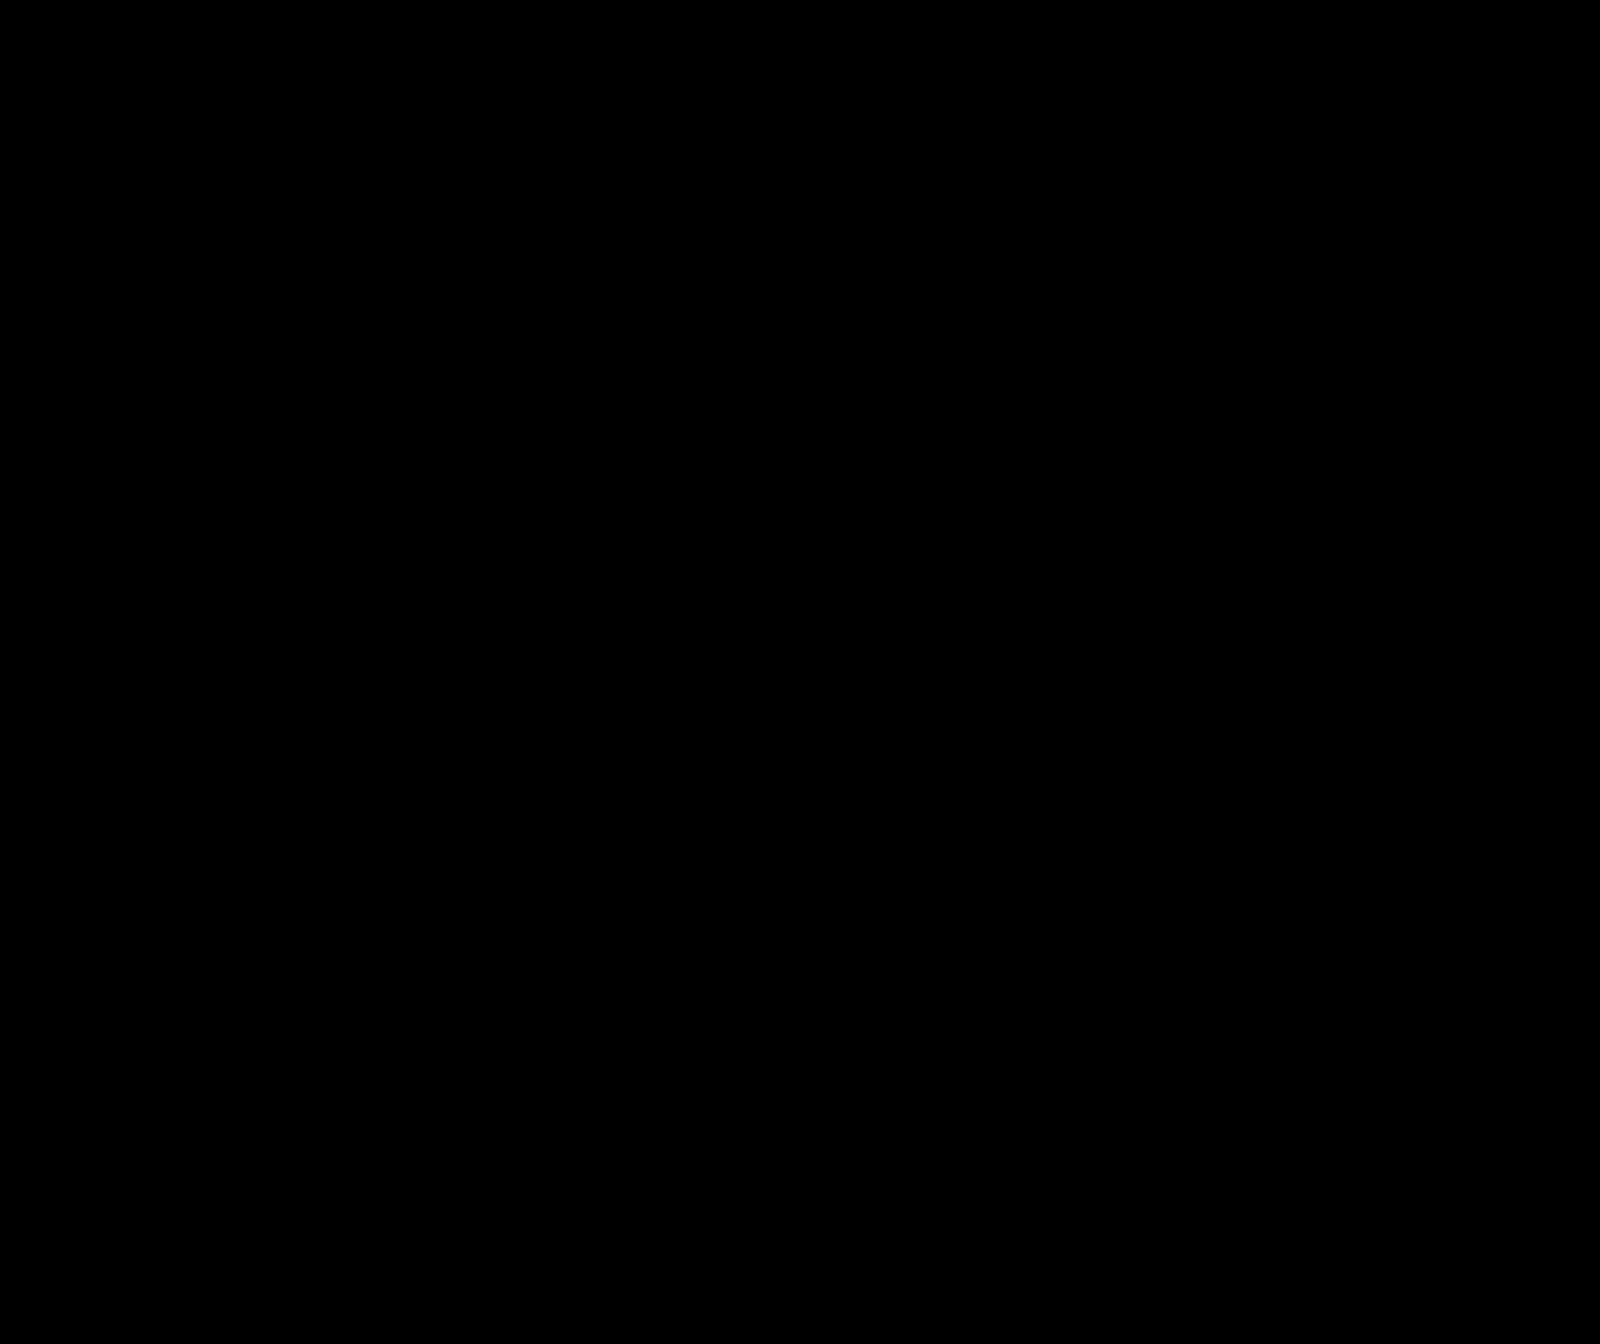 Animal SVG Clip arts